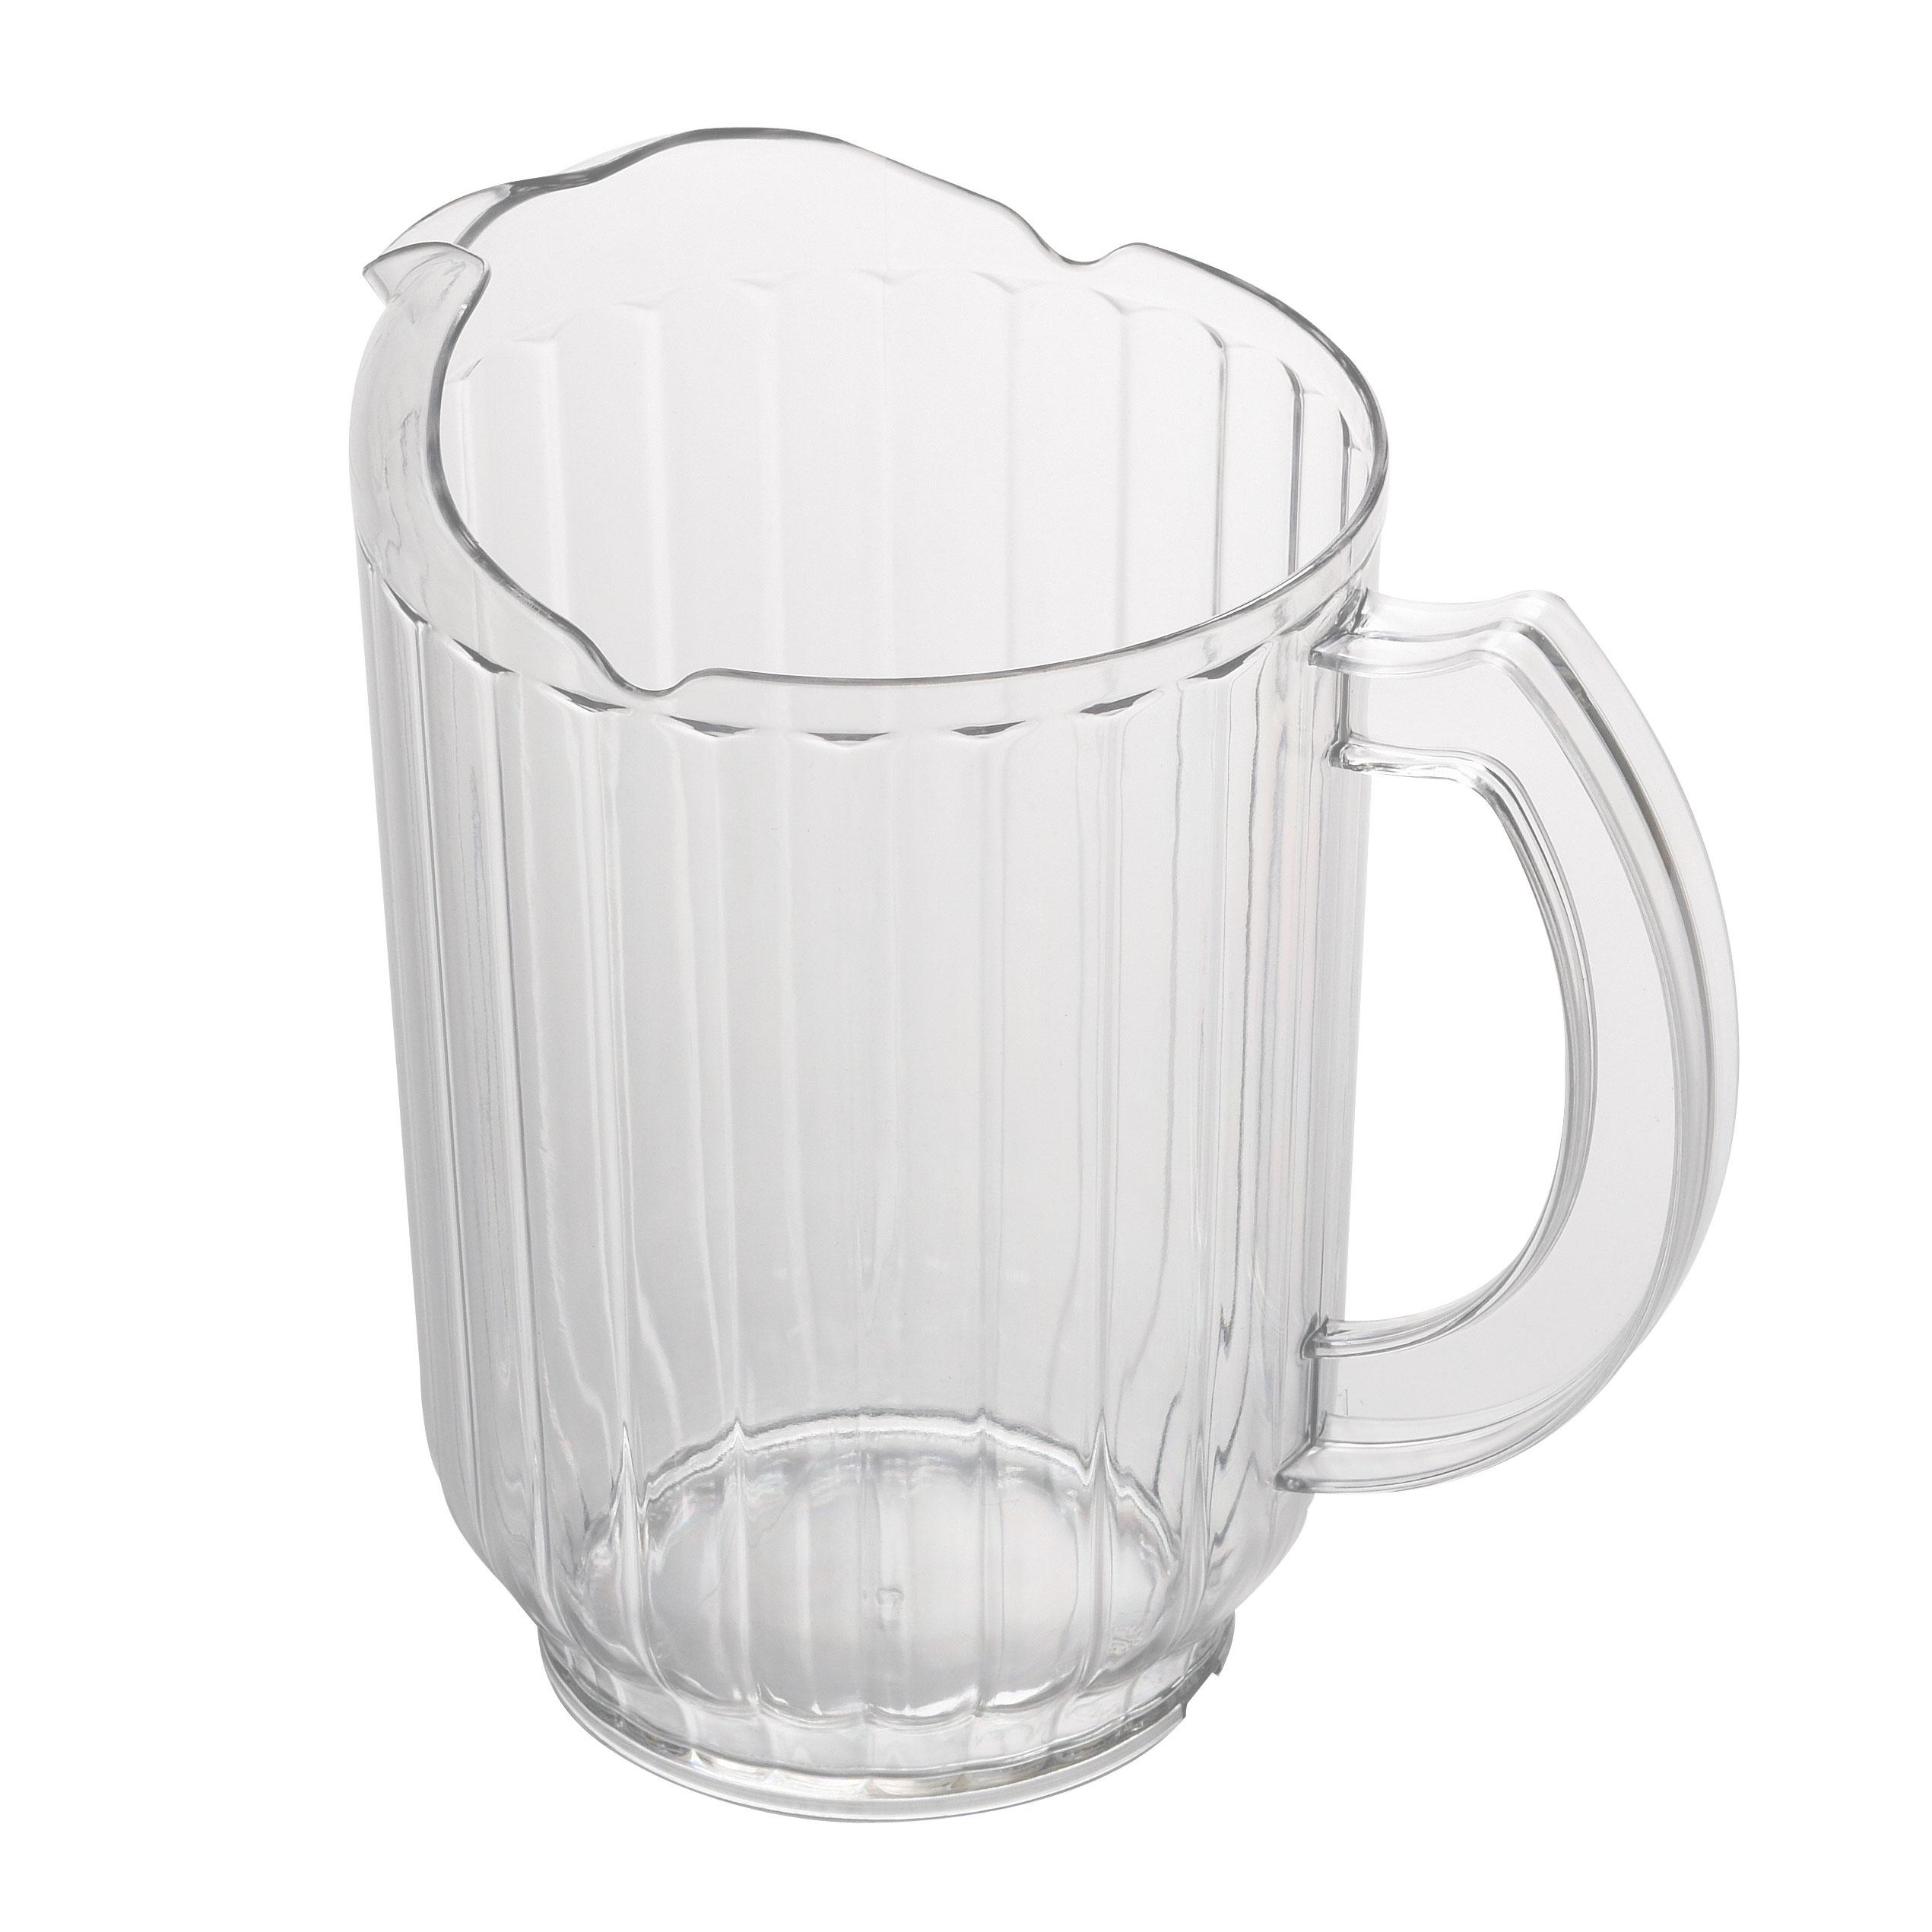 Cambro PE600CW135 serving jugs/pitchers/decanter